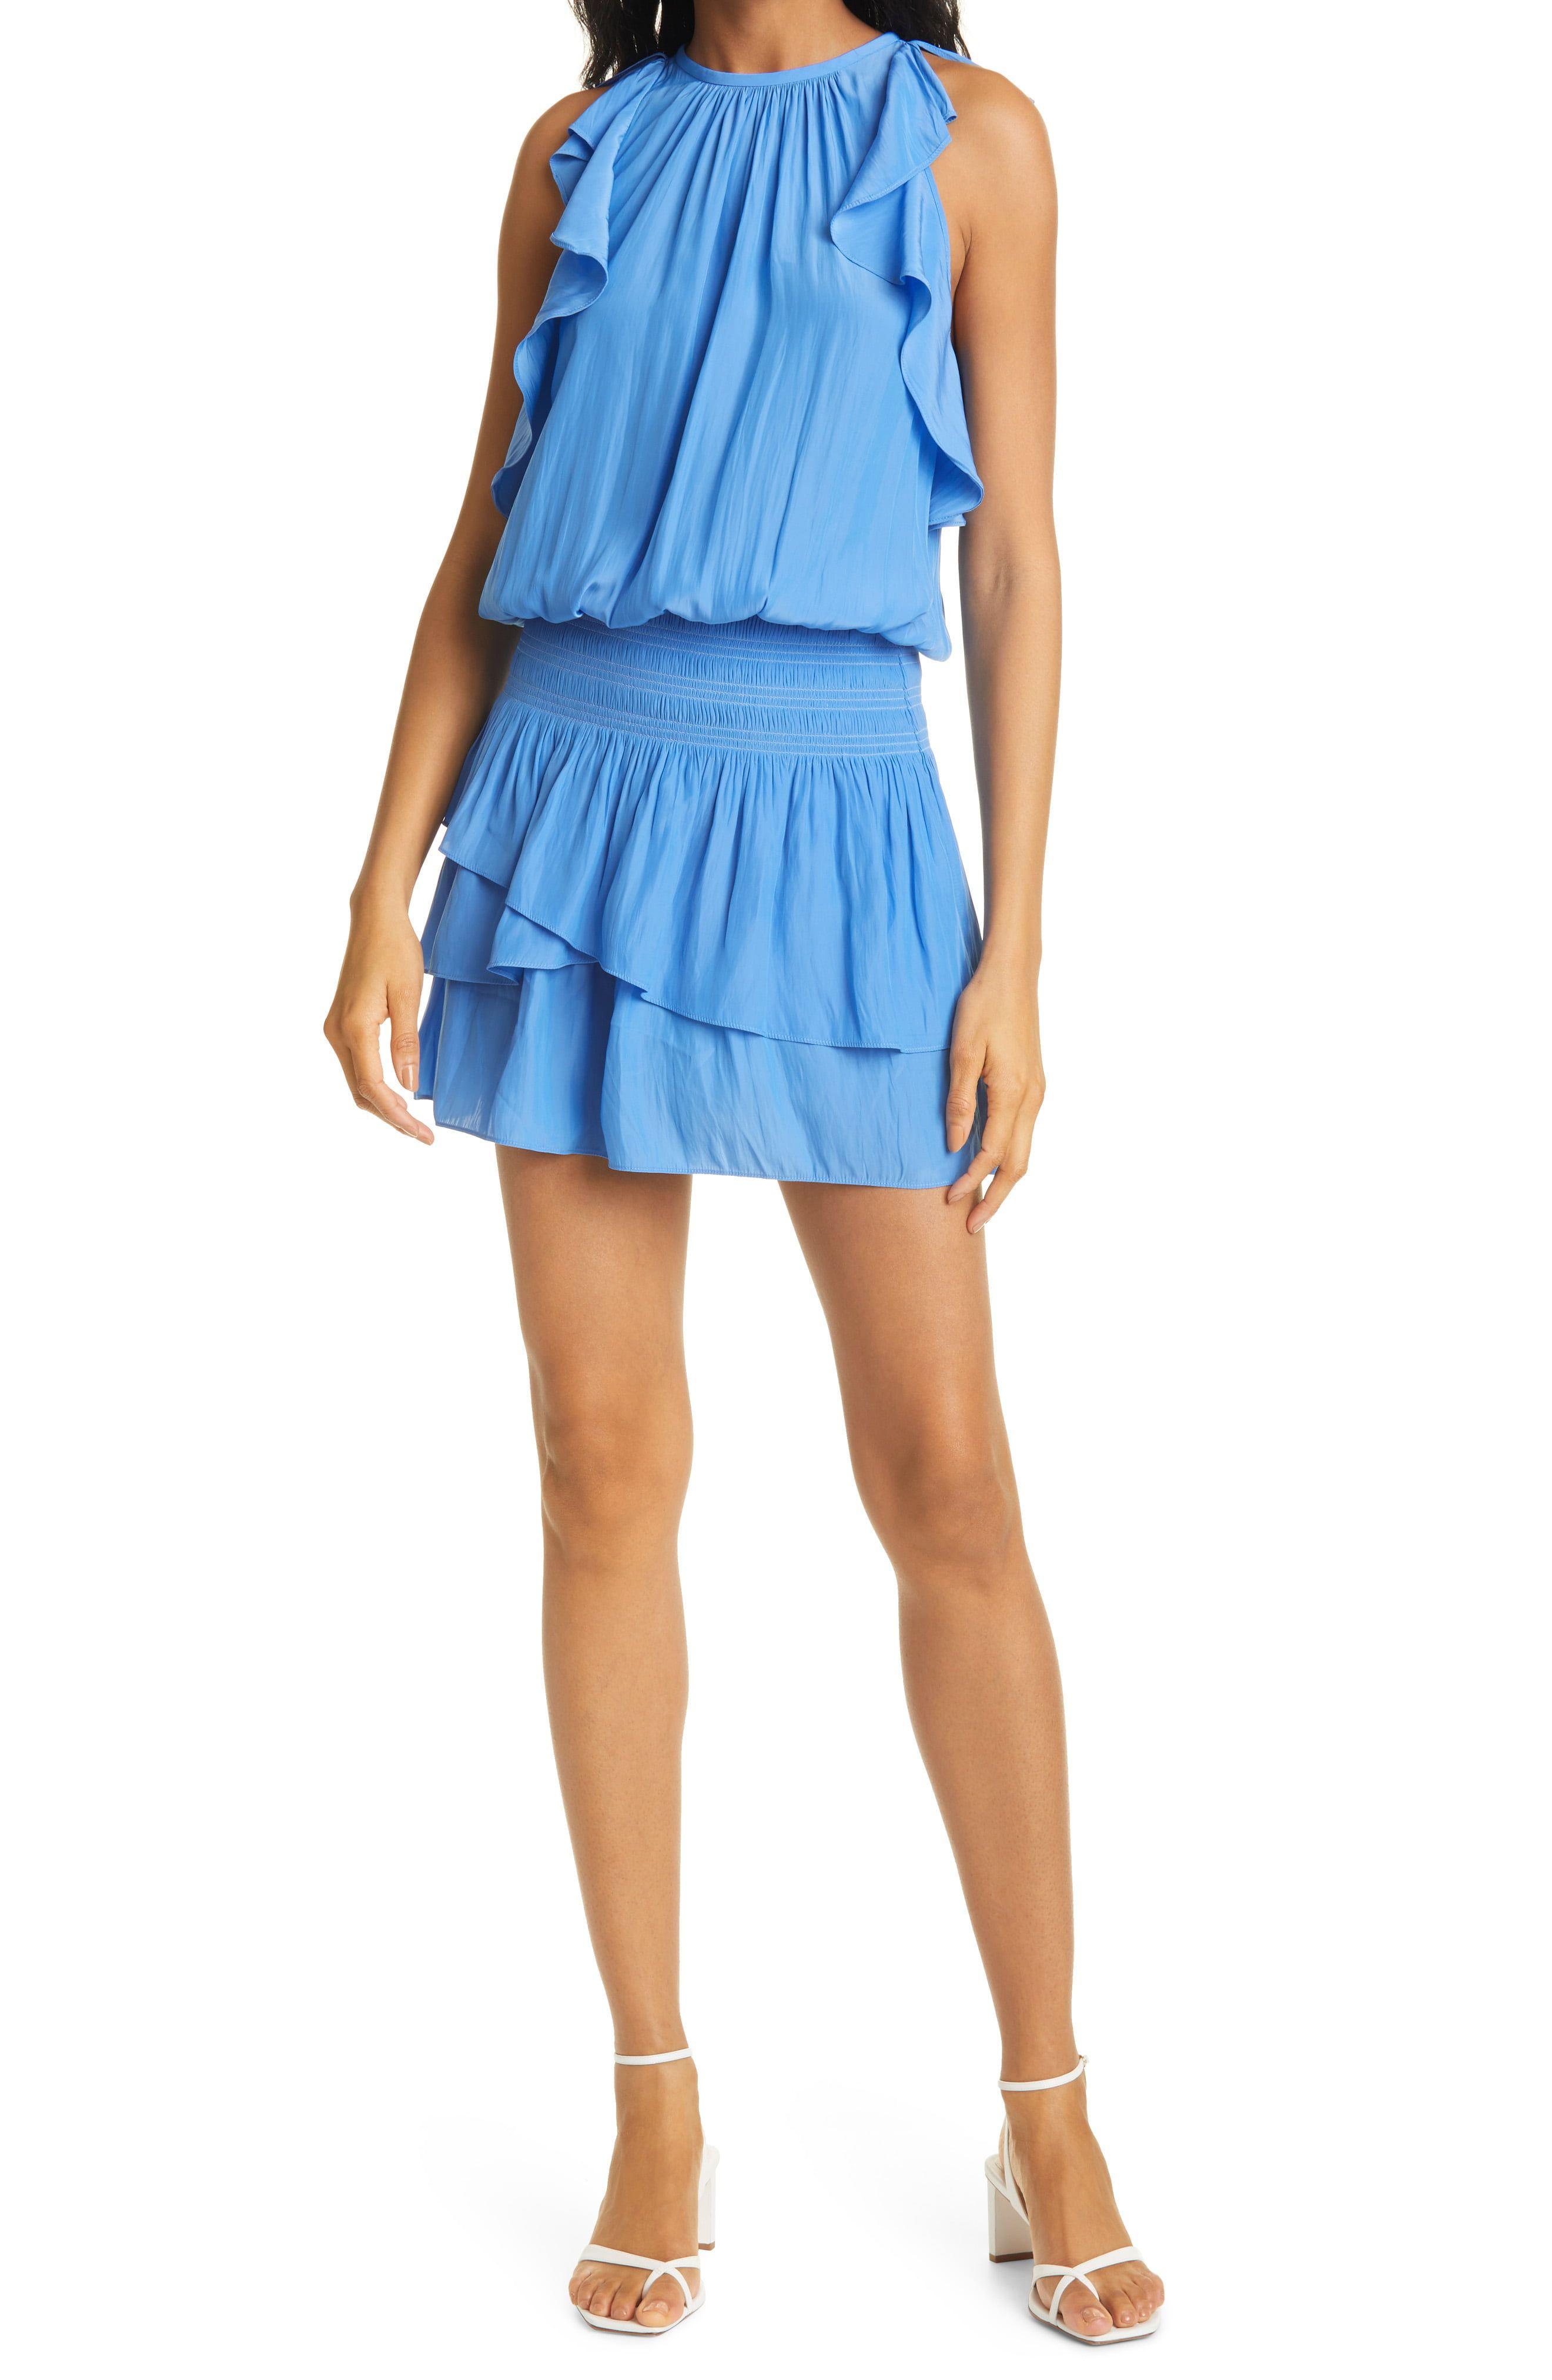 27+ Ramy brook dress ideas